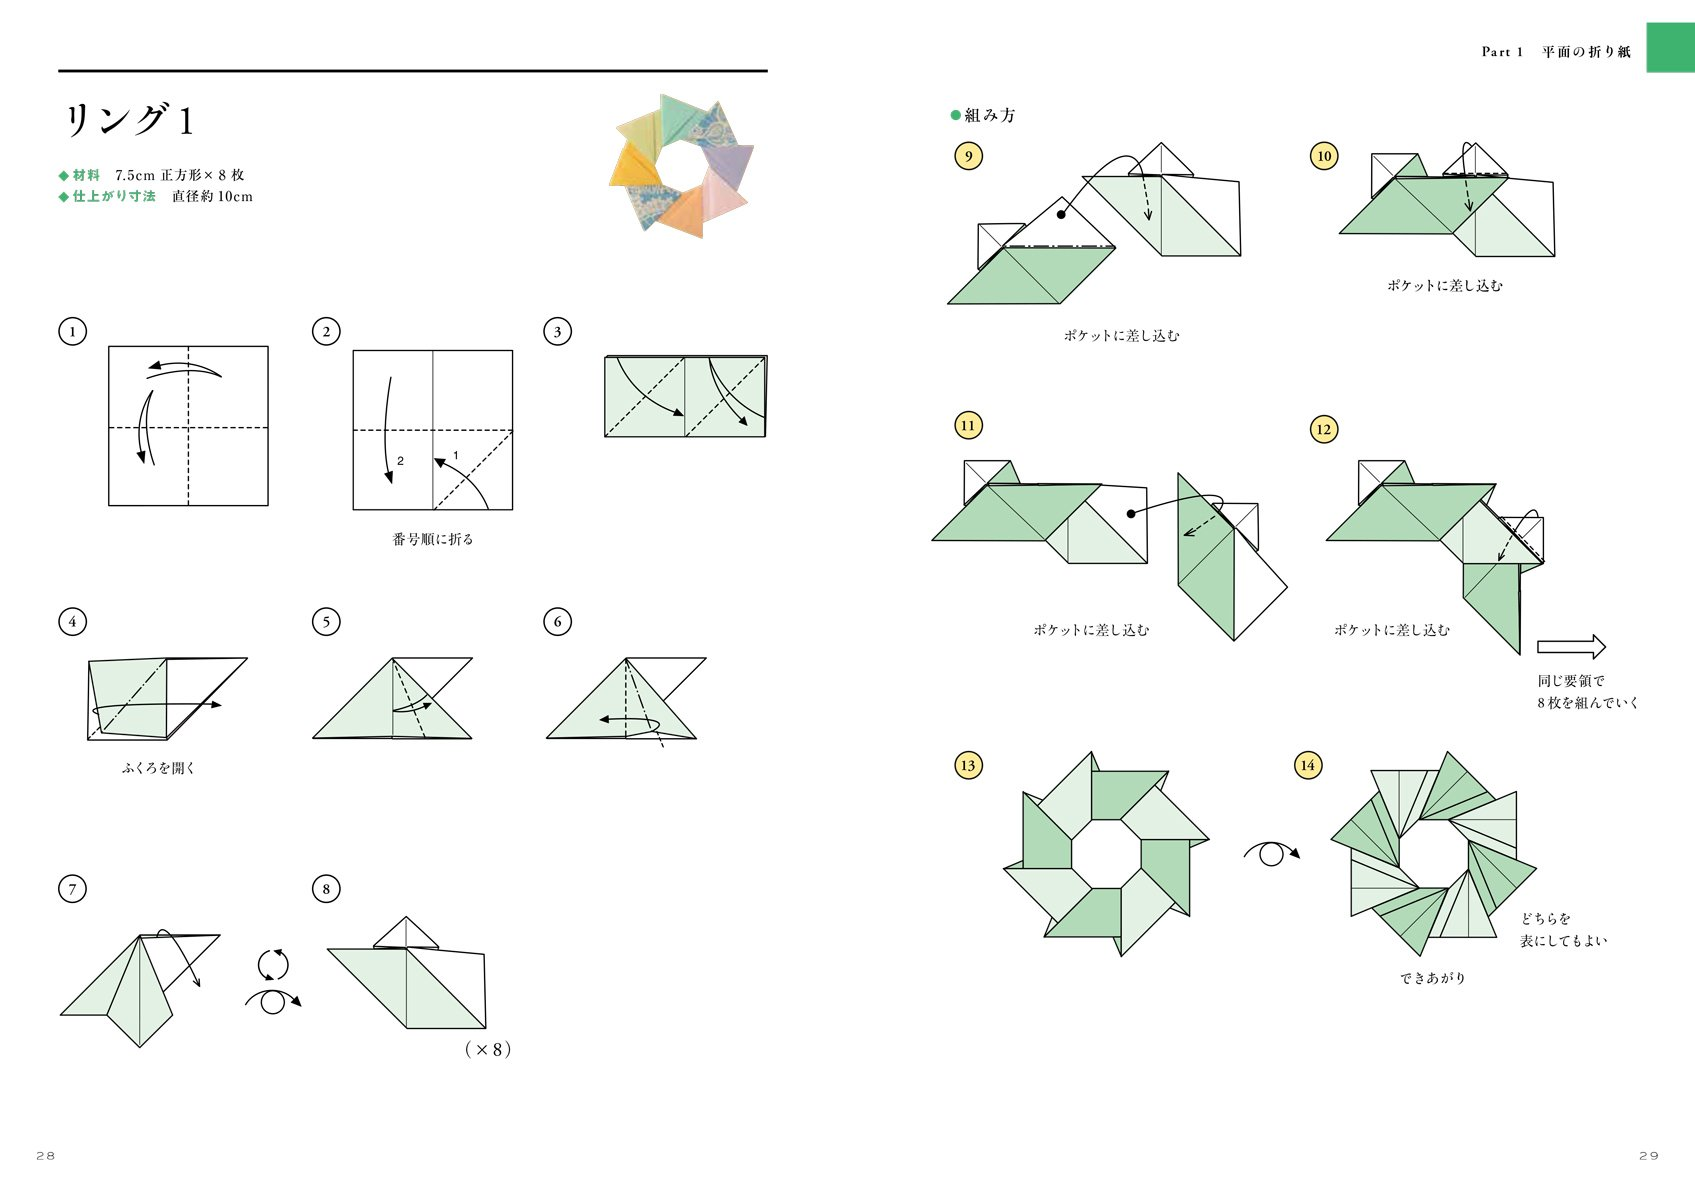 Boules Decoratives Anneaux Origami Tomoko Fuse Diagrams